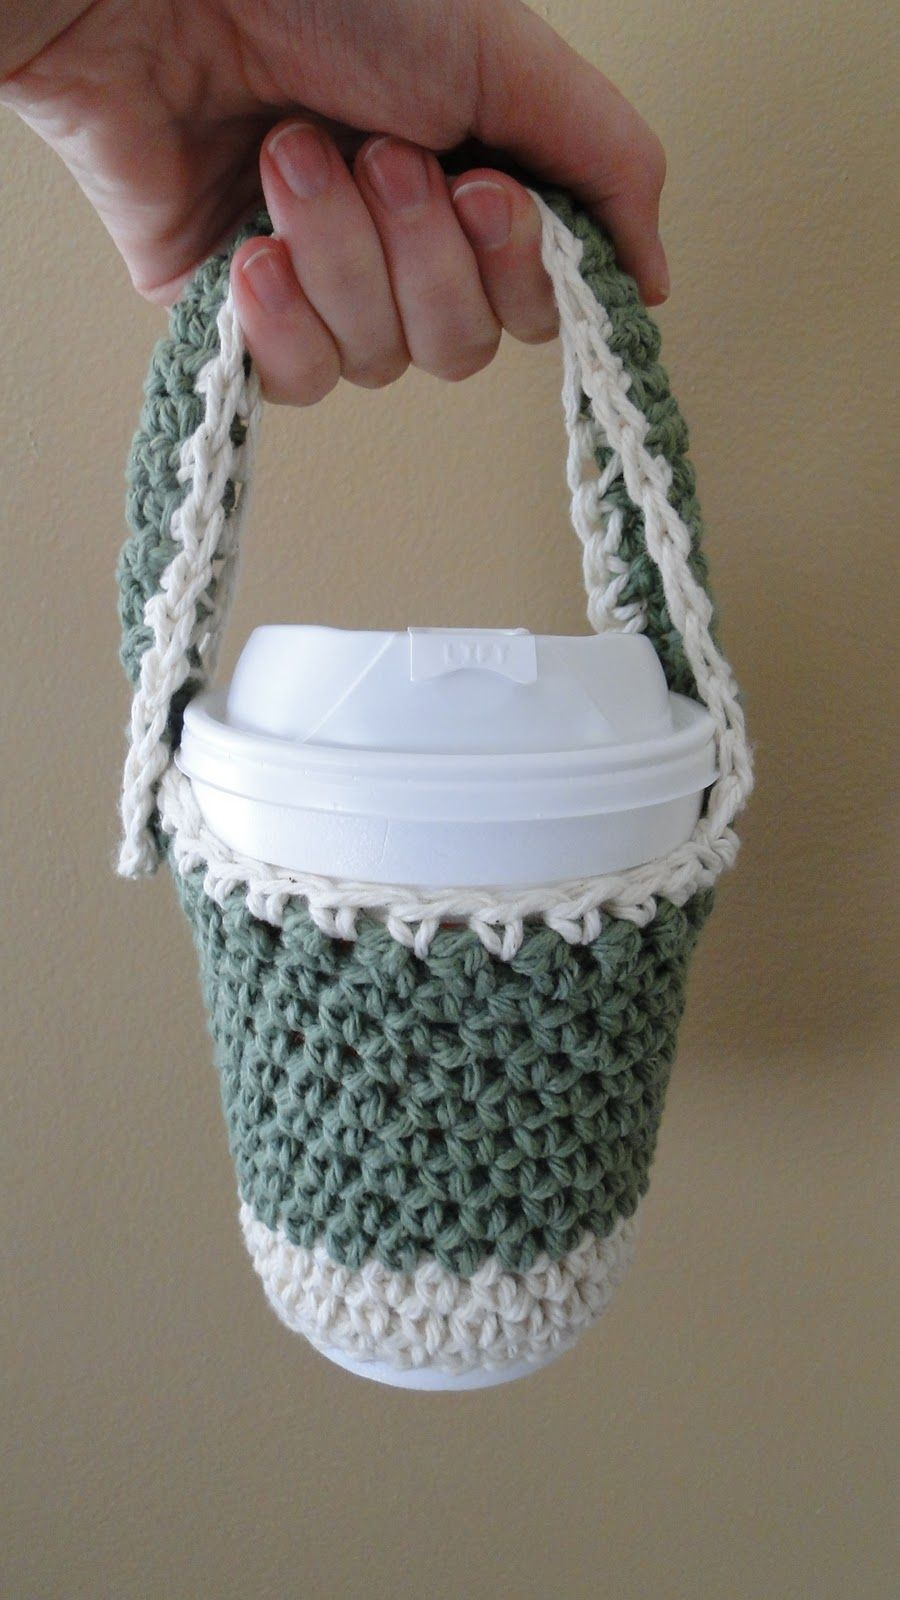 crochet+holder+pattem. | Ruby Knits: Free Pattern Friday is BACK ...